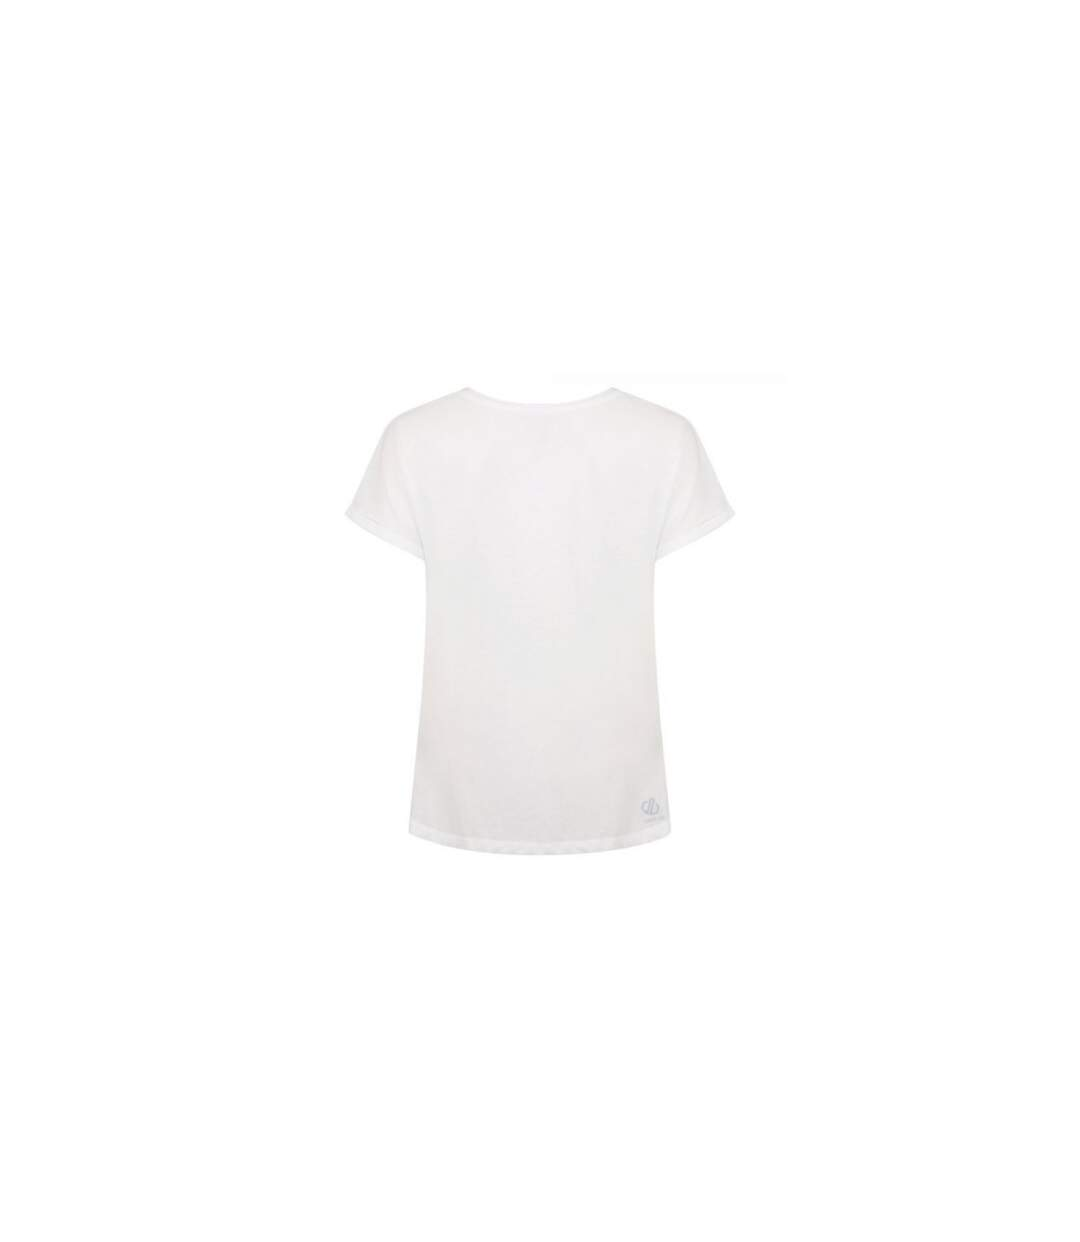 Dare 2B - T-Shirt Imprimé Summer Days - Femme (Blanc) - UTRG4274